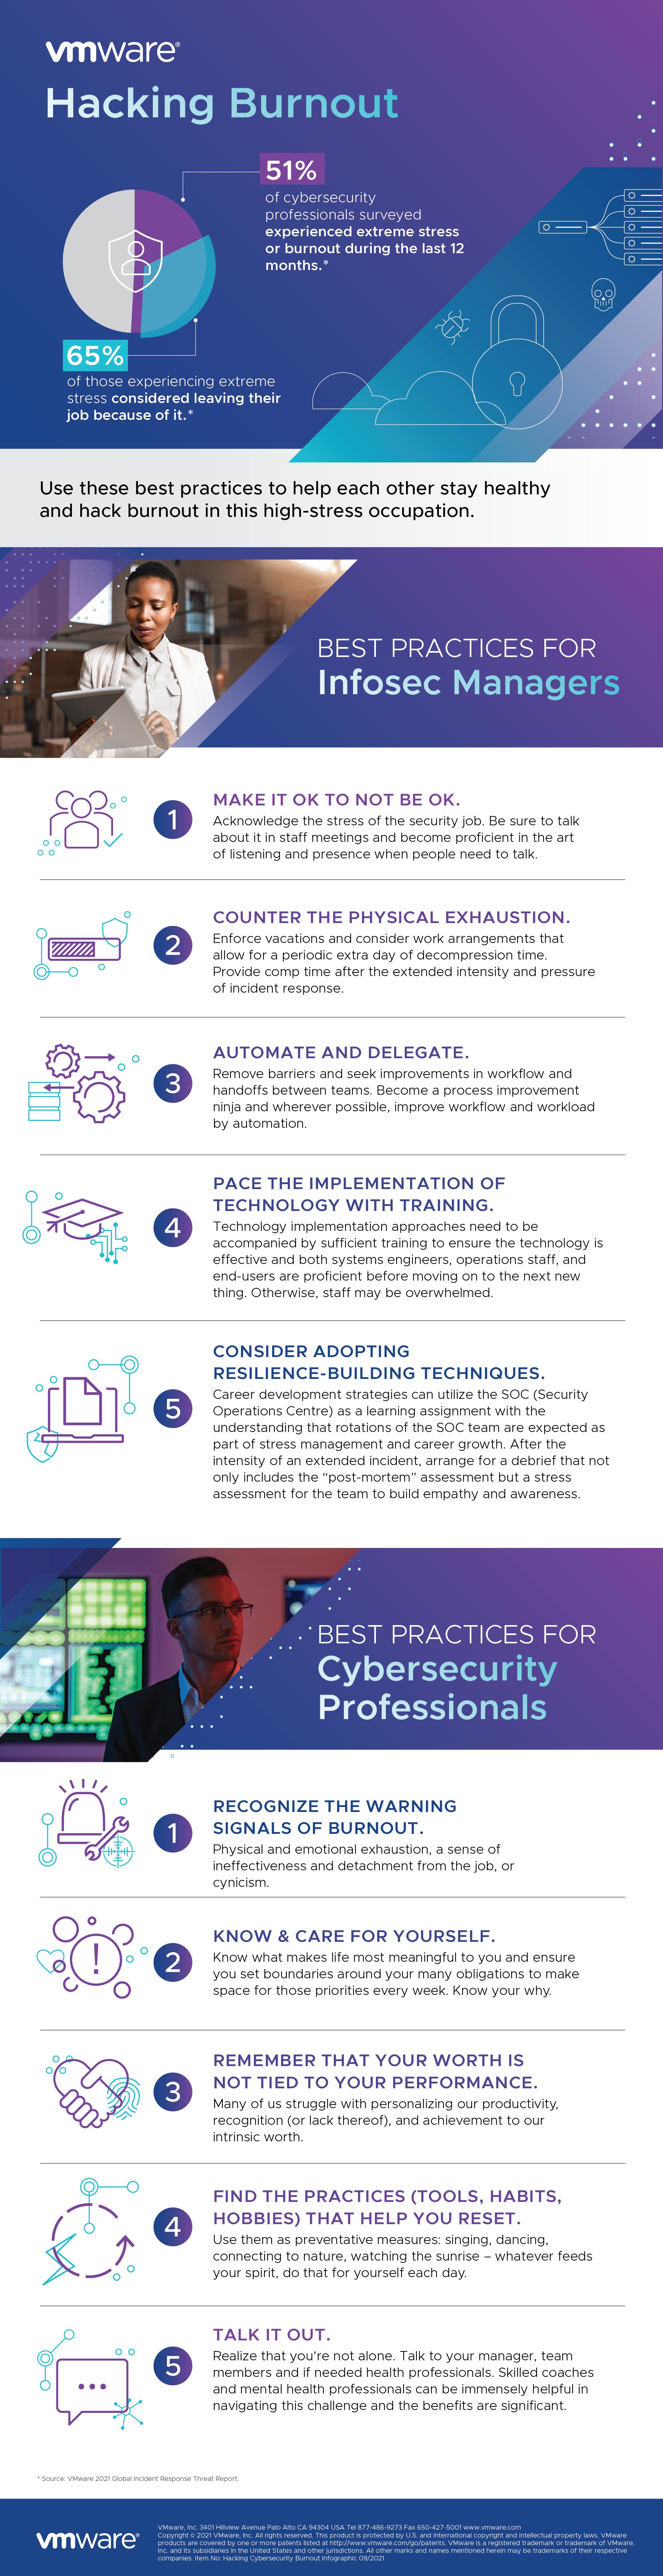 Hacking Burnout Infographic